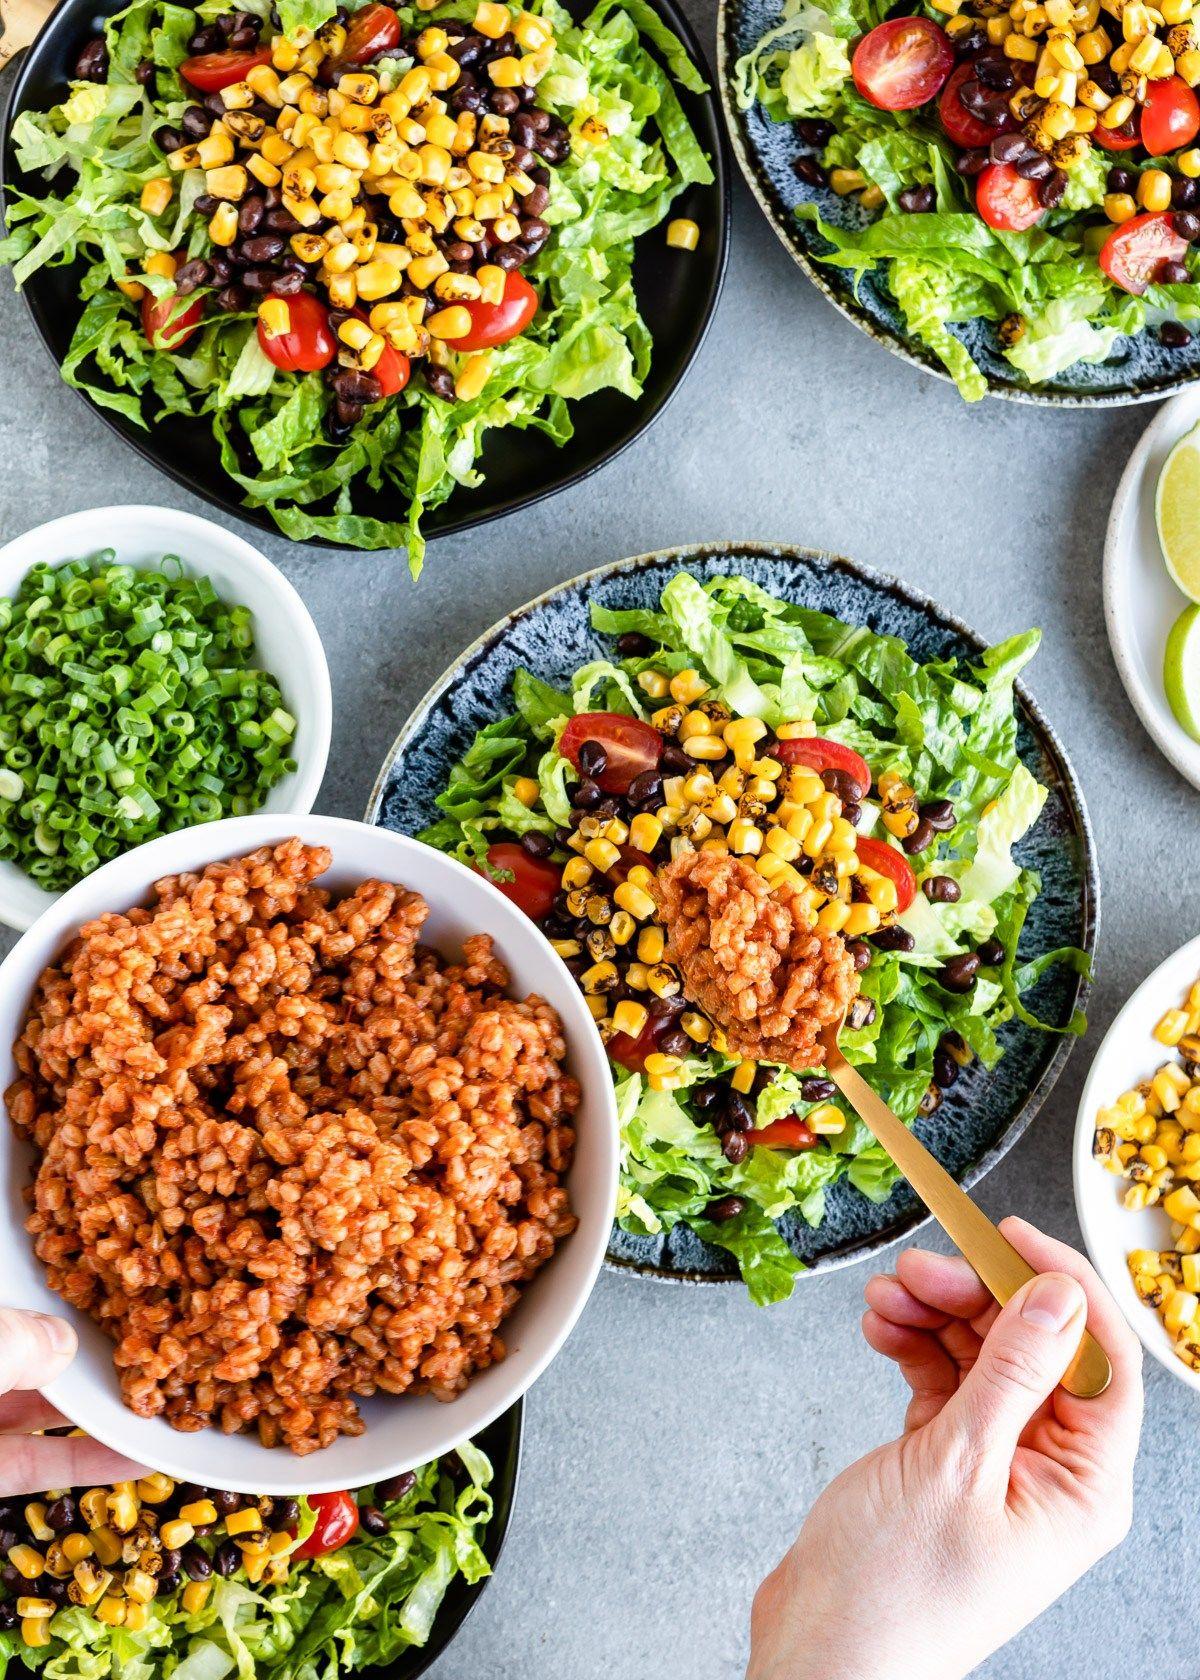 Ridiculously Big Vegetarian Taco Salad Hello Veggie Recipe Vegetarian Taco Salad Vegan Recipes Healthy Vegan Salad Recipes